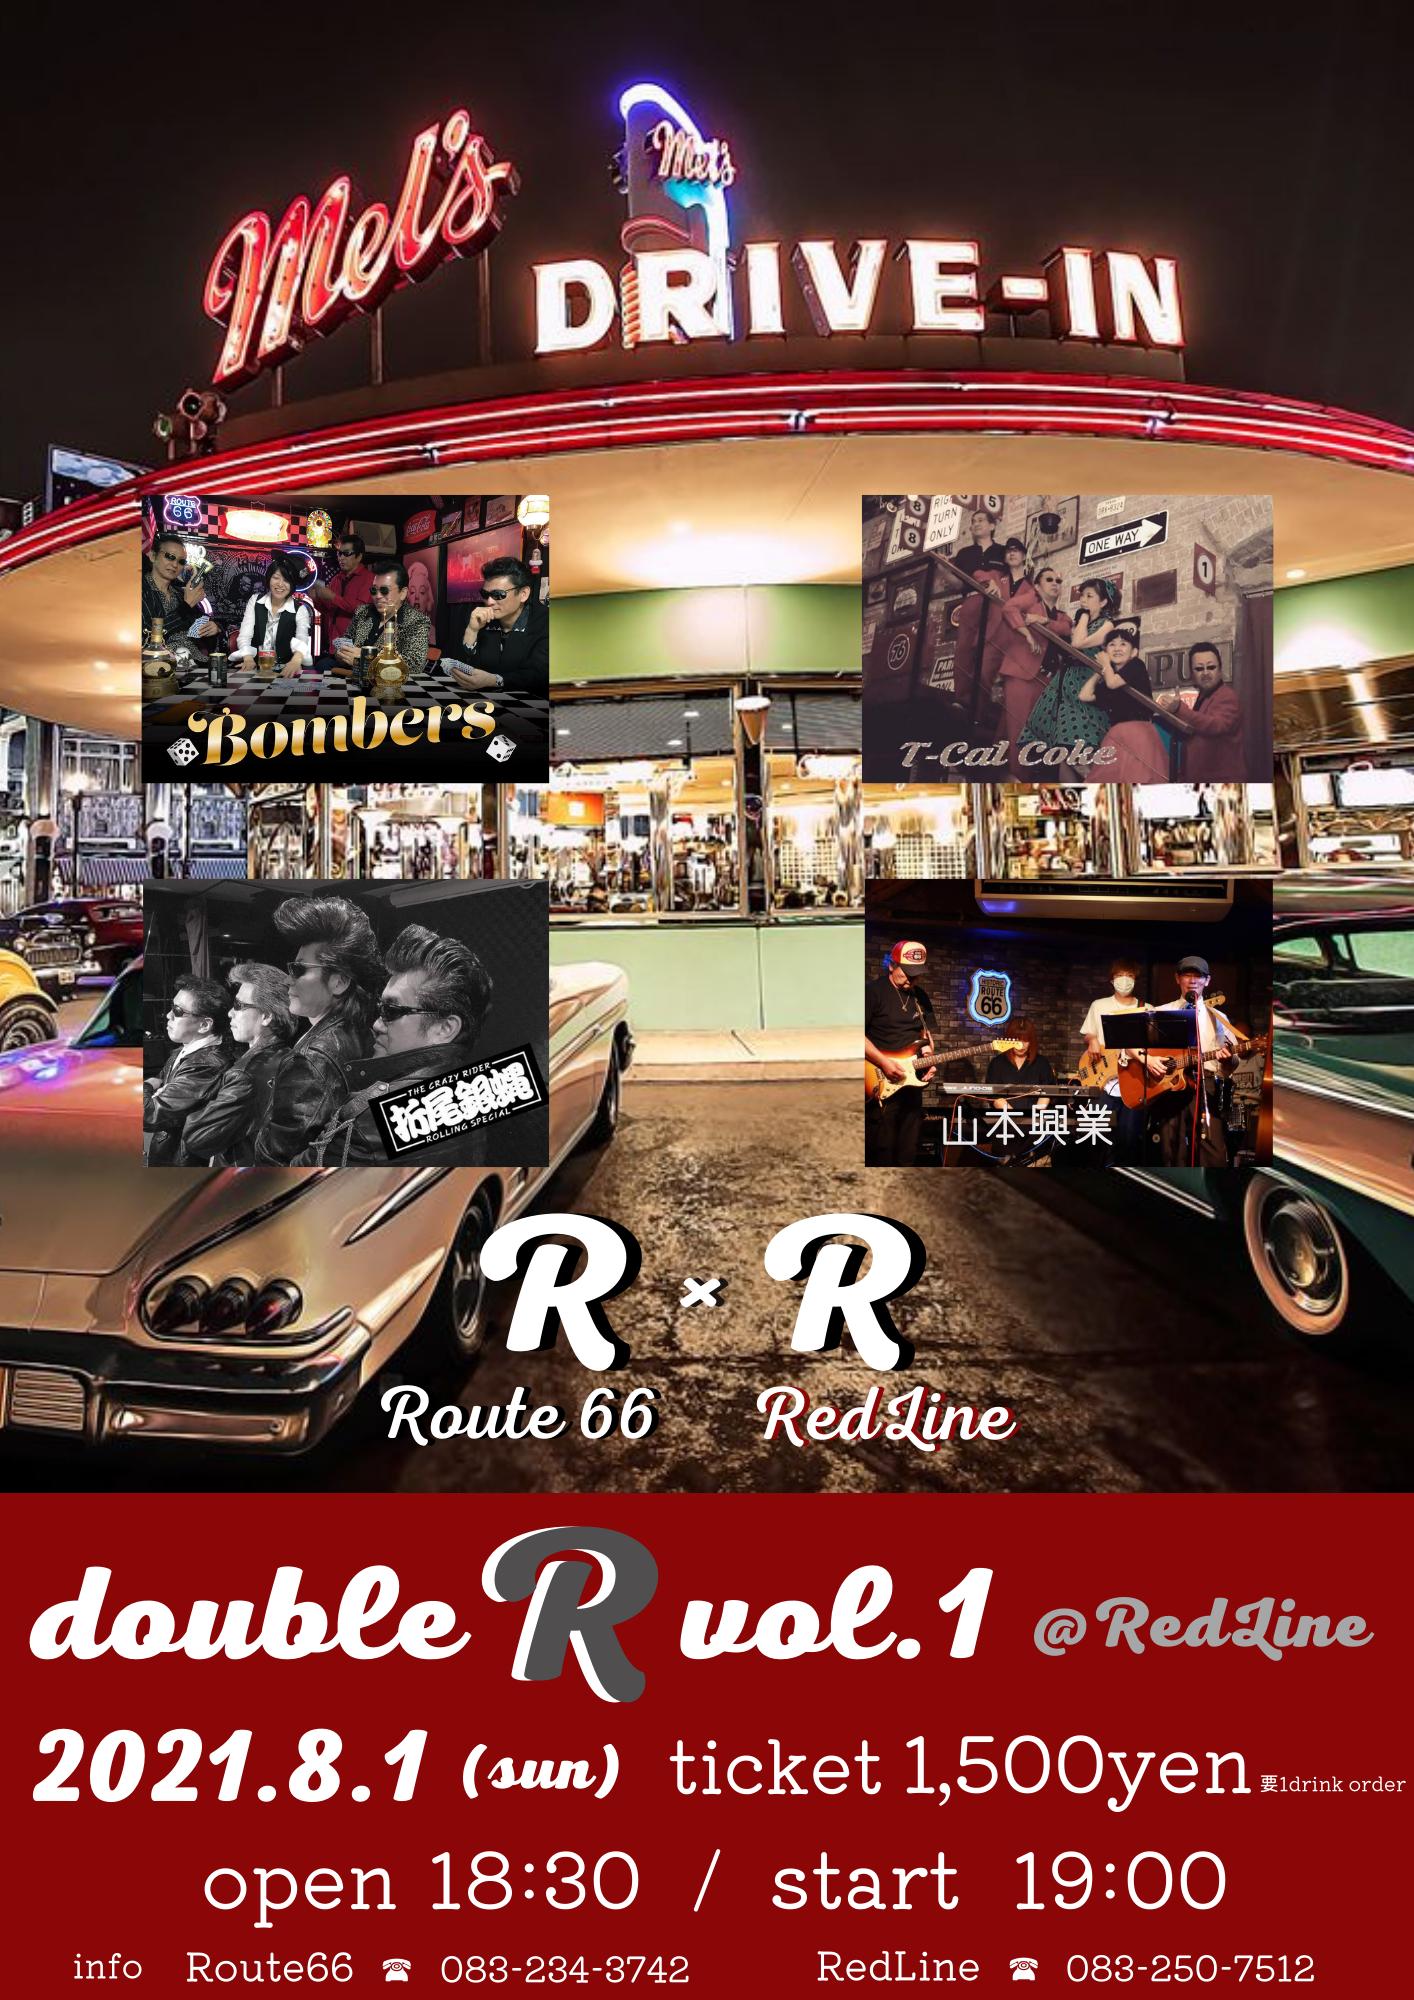 Double R vol.1